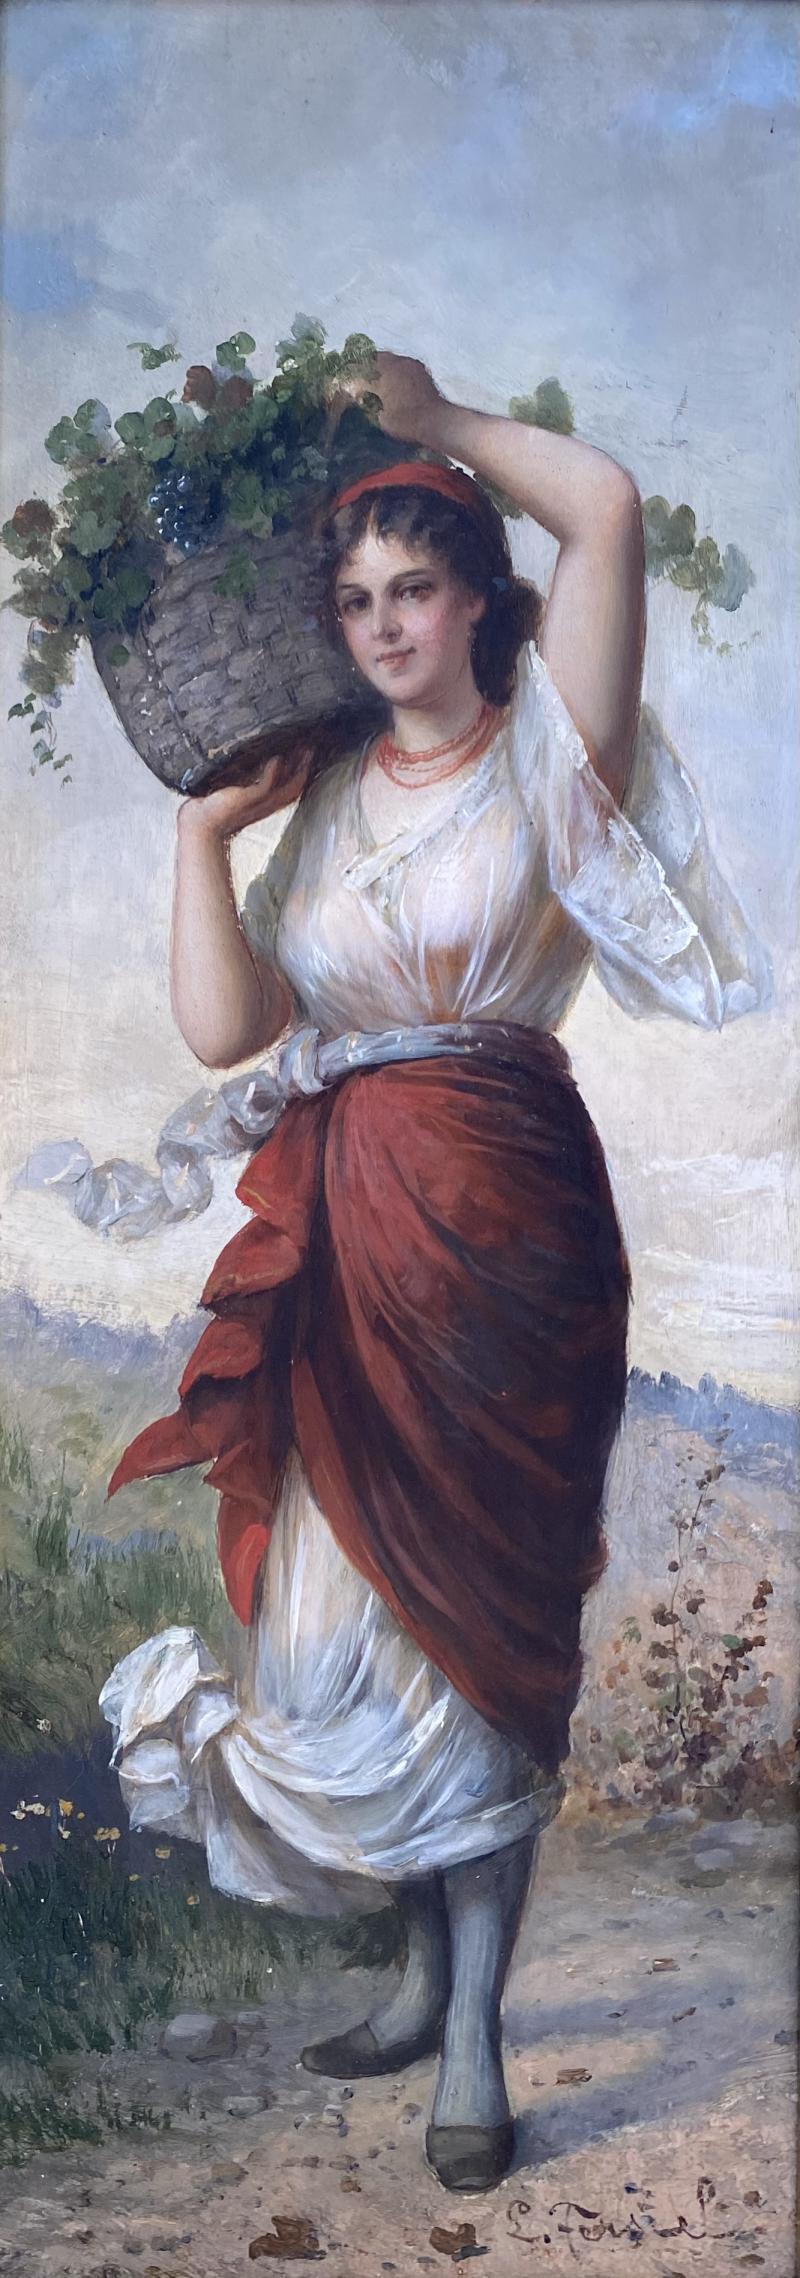 Ludwig Ferstel Dalmatian Grape Seller